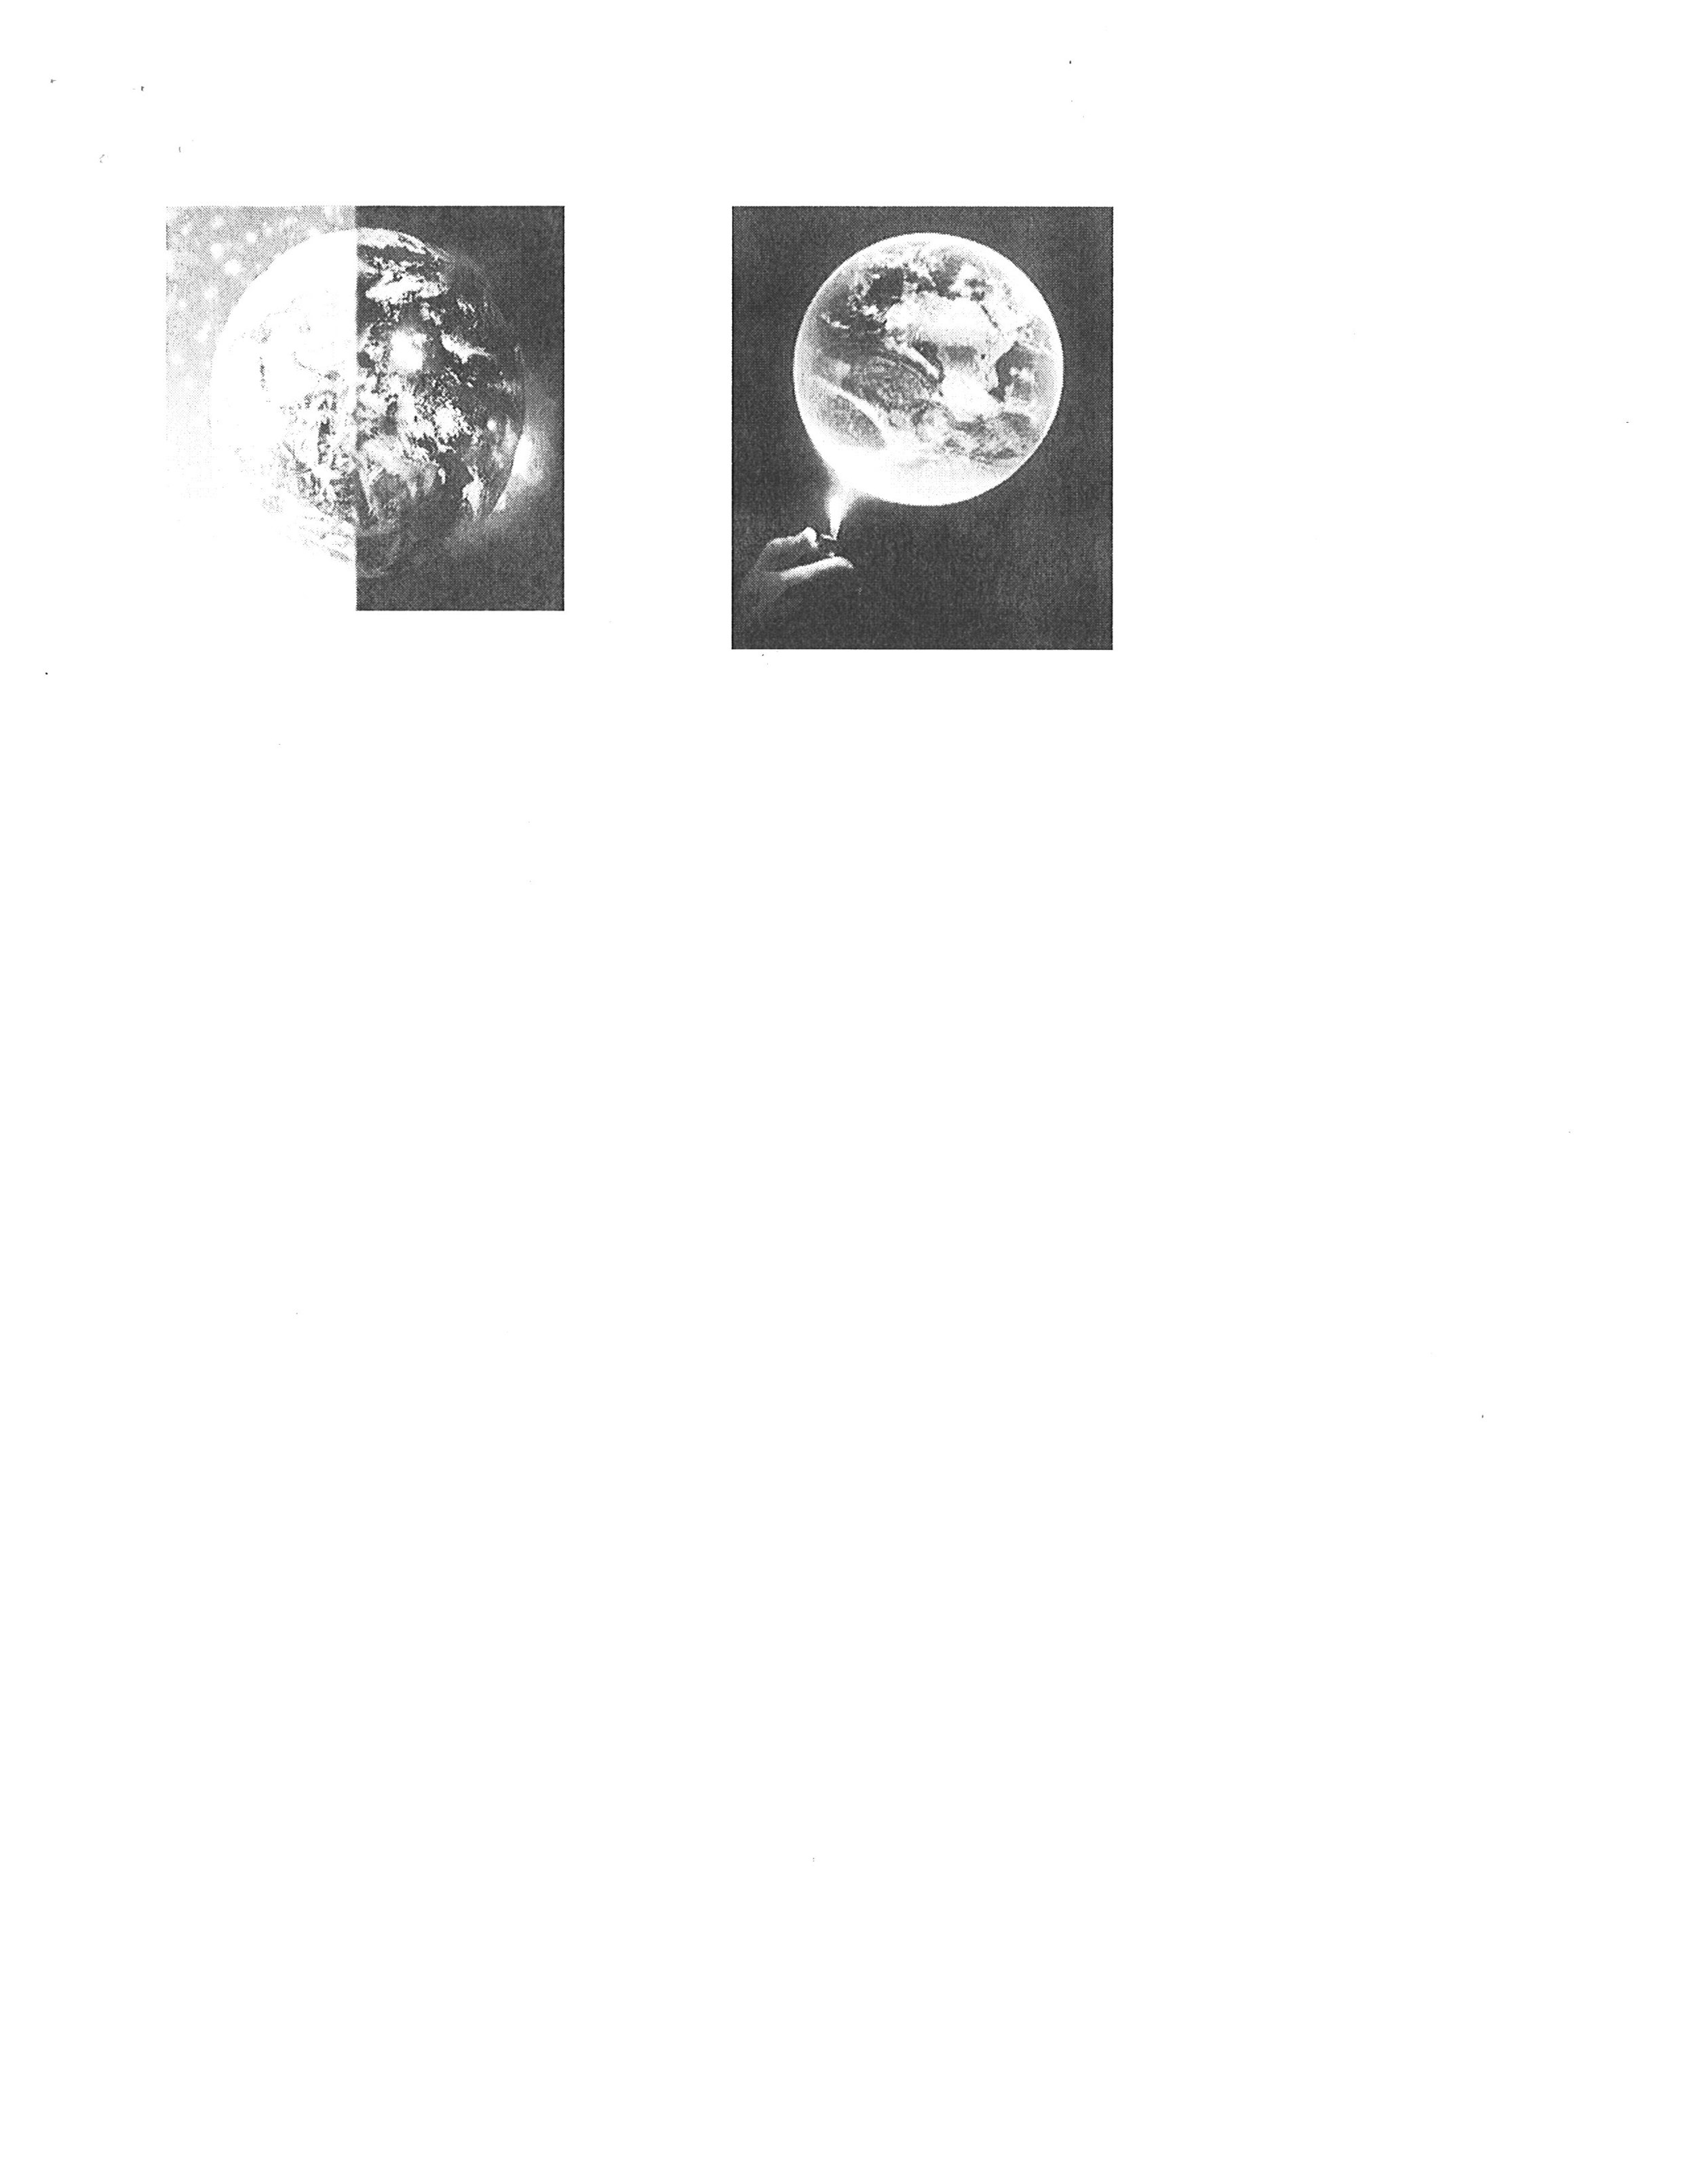 7. Scanned from a Xerox Multifunction Printer002.jpg